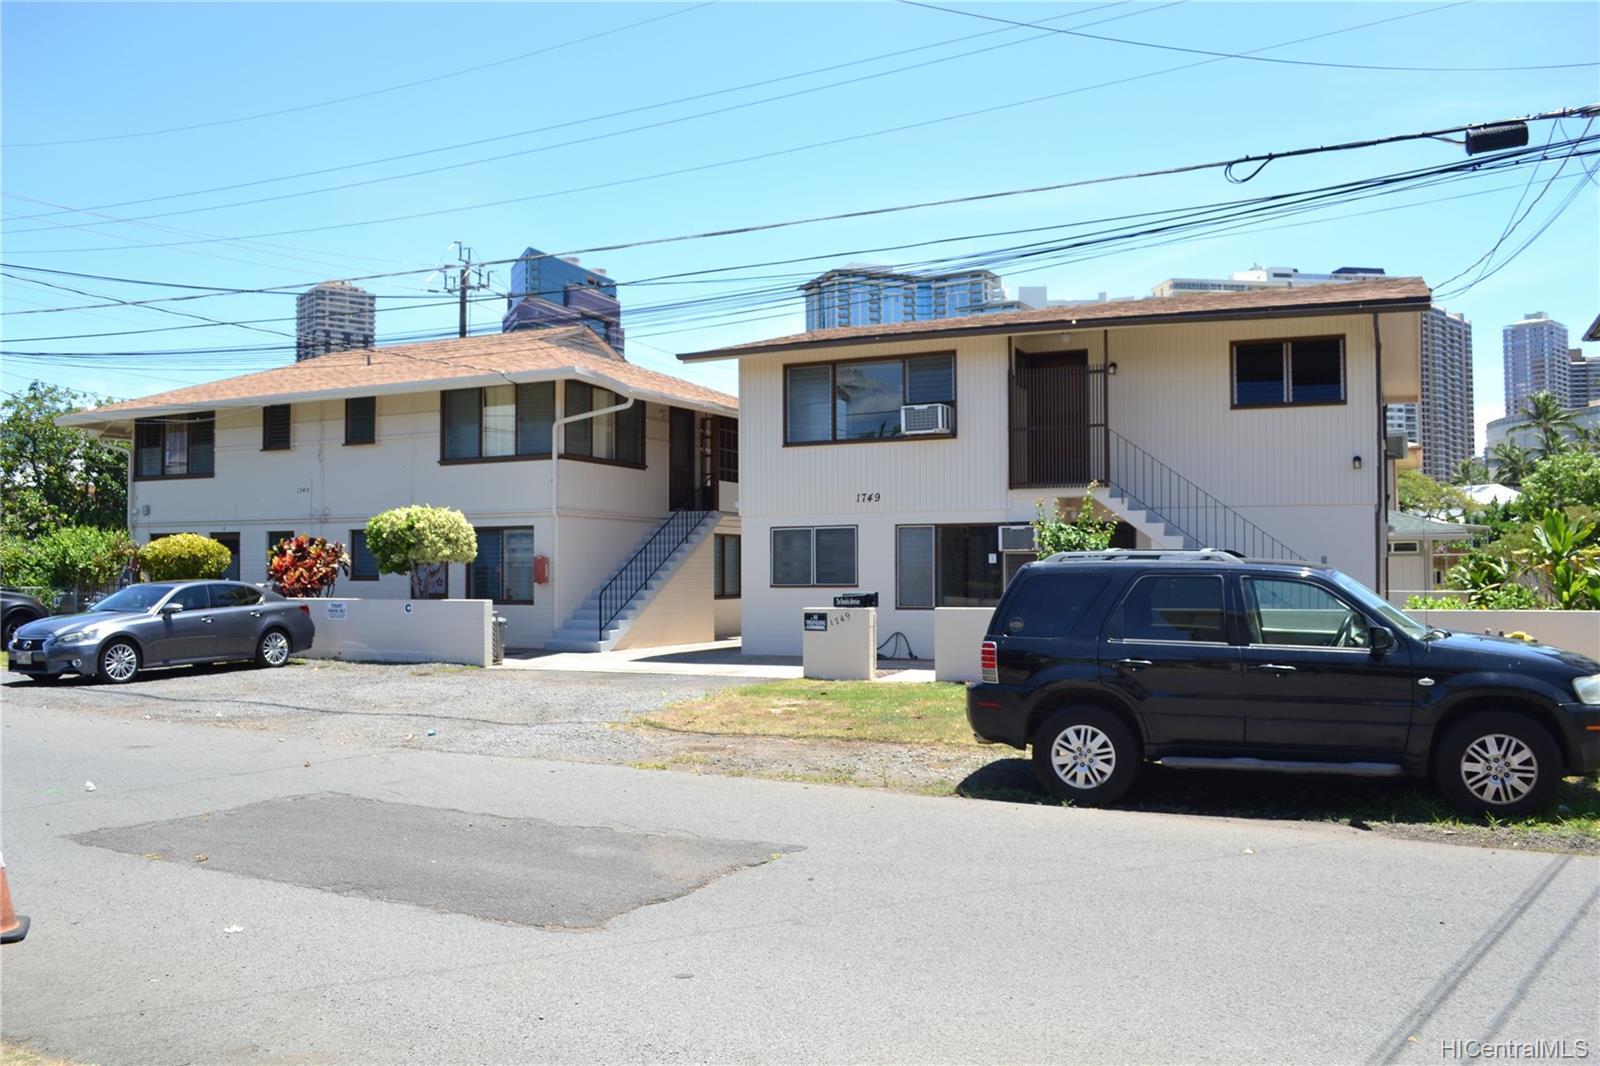 1749 Lime Street, Honolulu HI 96826 - MLS #201922876 - Honolulu Real